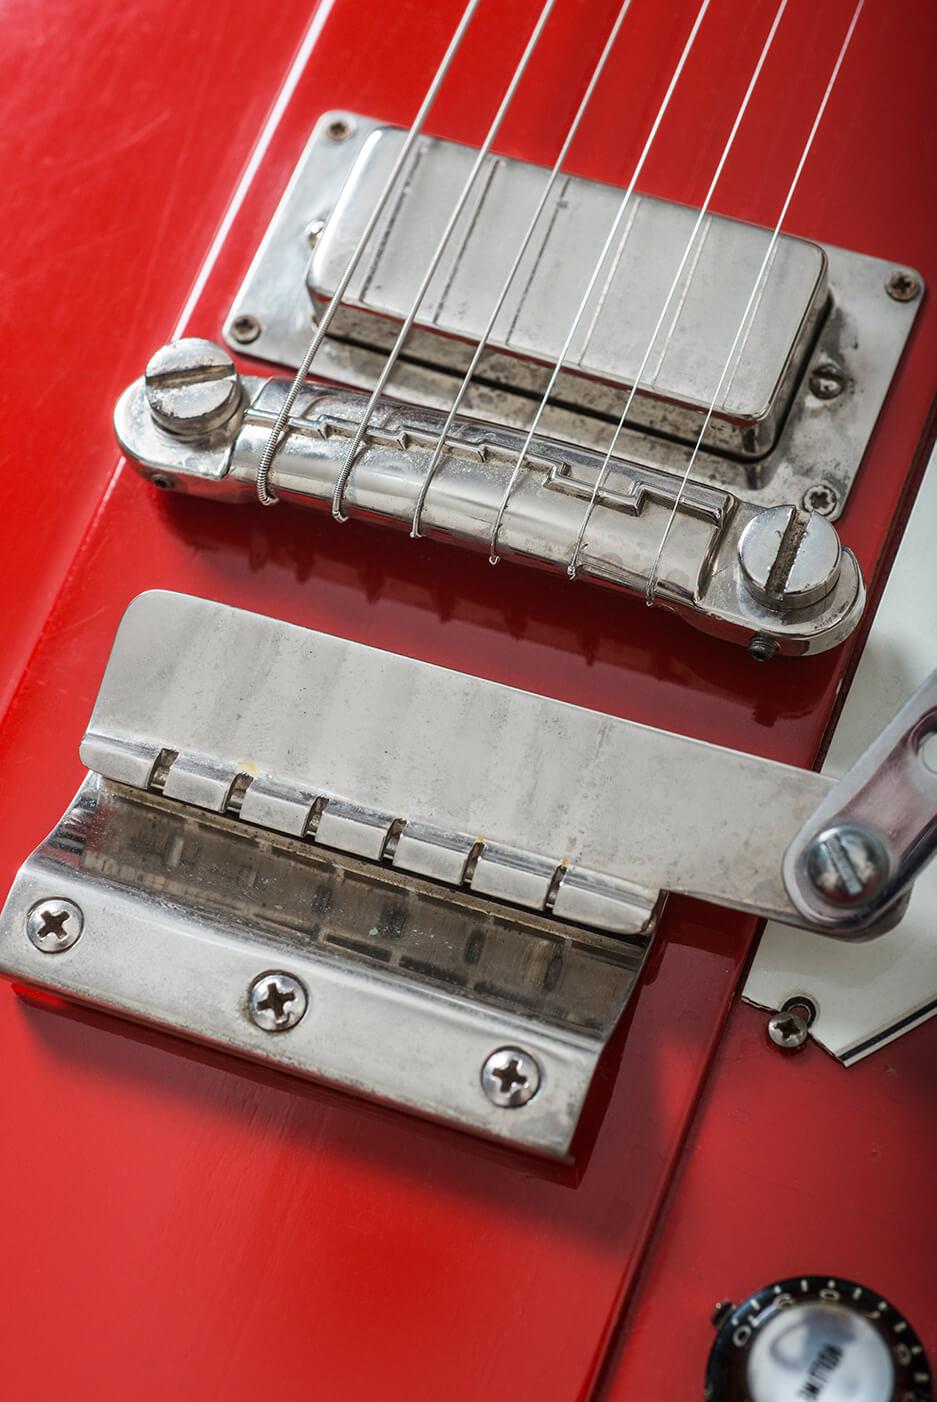 Gibson 1964 Firebird III red bridge humbucker and bridge